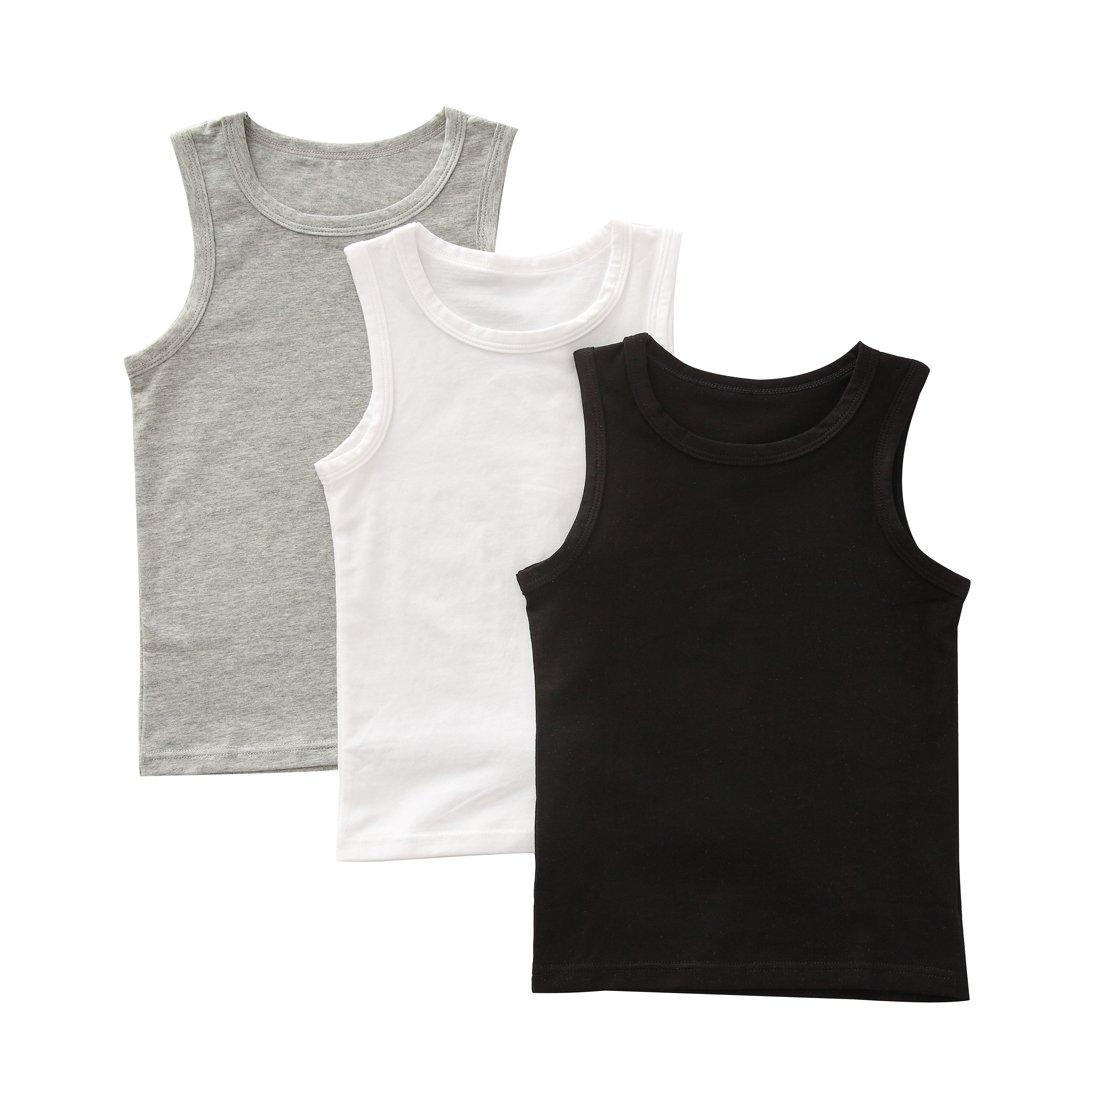 benetia Toddler BoysTank Tops Summer Soft Cotton 3 -Pack